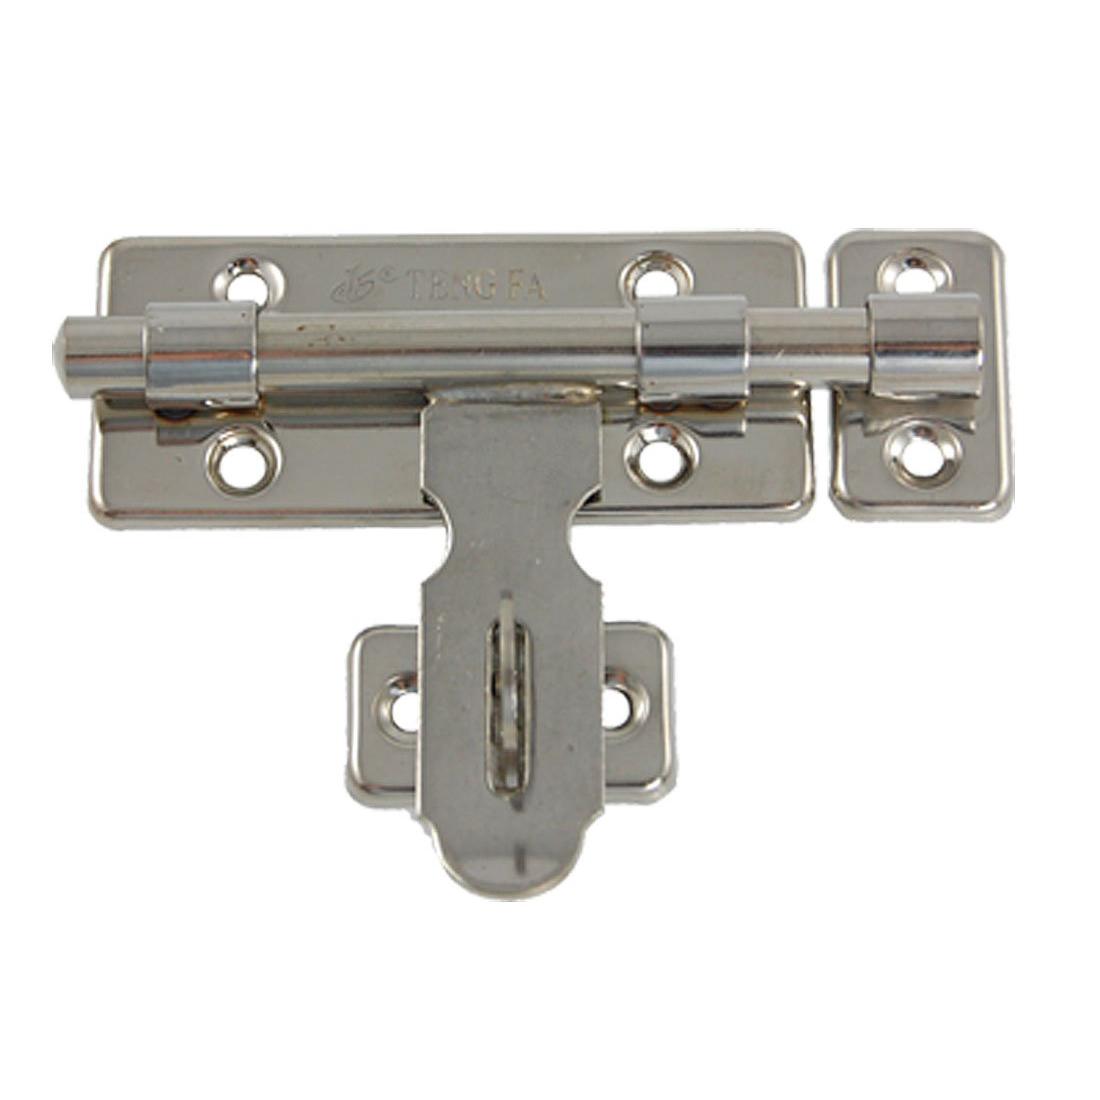 Generic Hardware Door Lock Barrel Bolt Latch Padlock Clasp Set K5m6